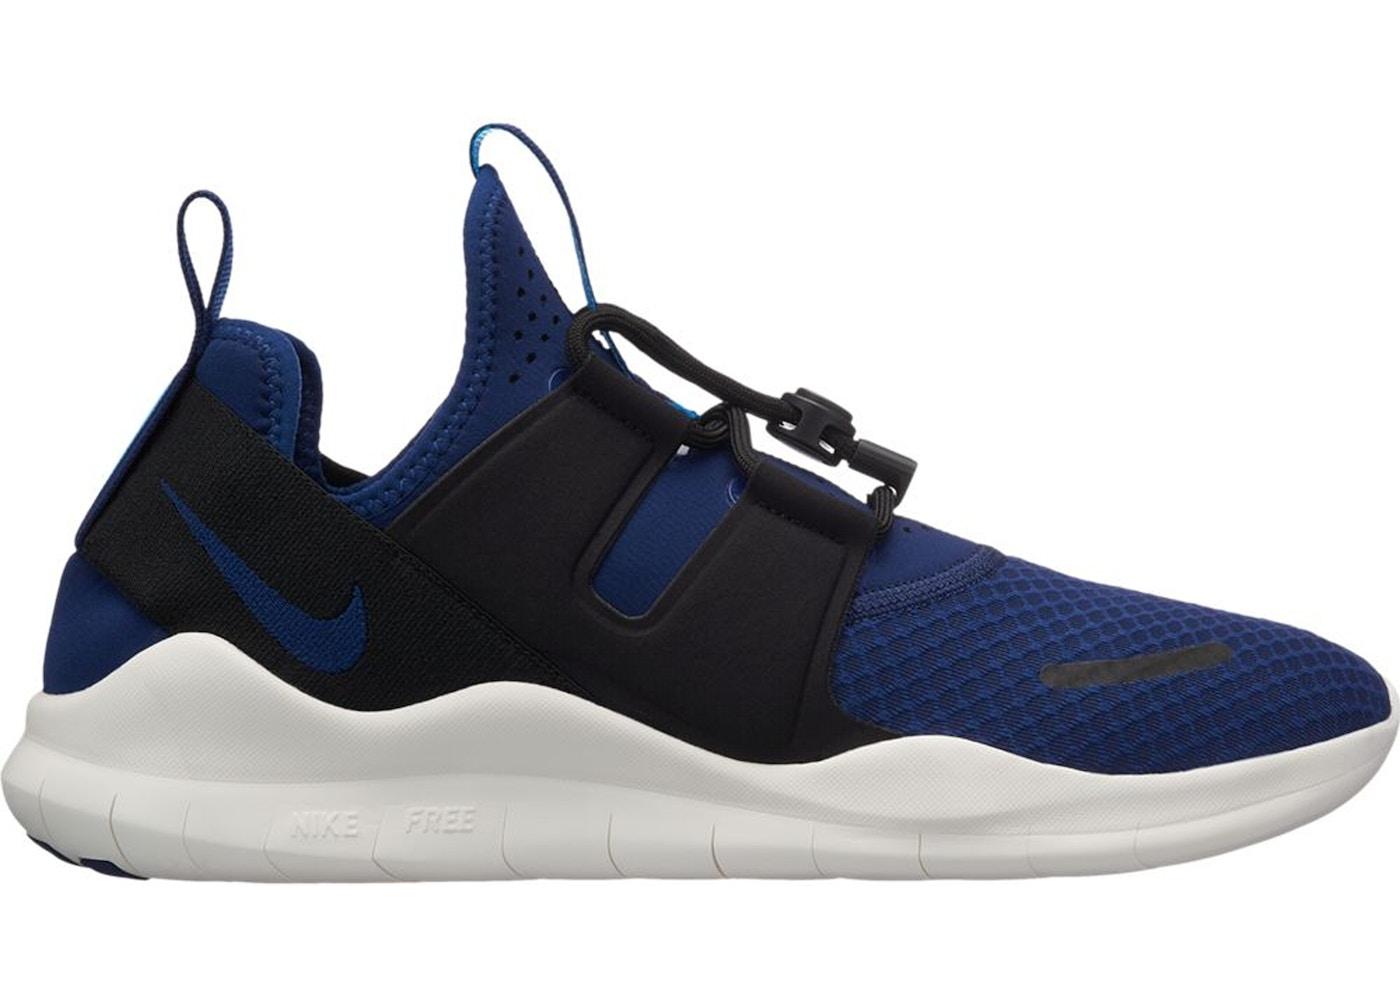 46202a9bfa3de Nike Free RN CMTR 2018 Blue Void Black - AA1620-400